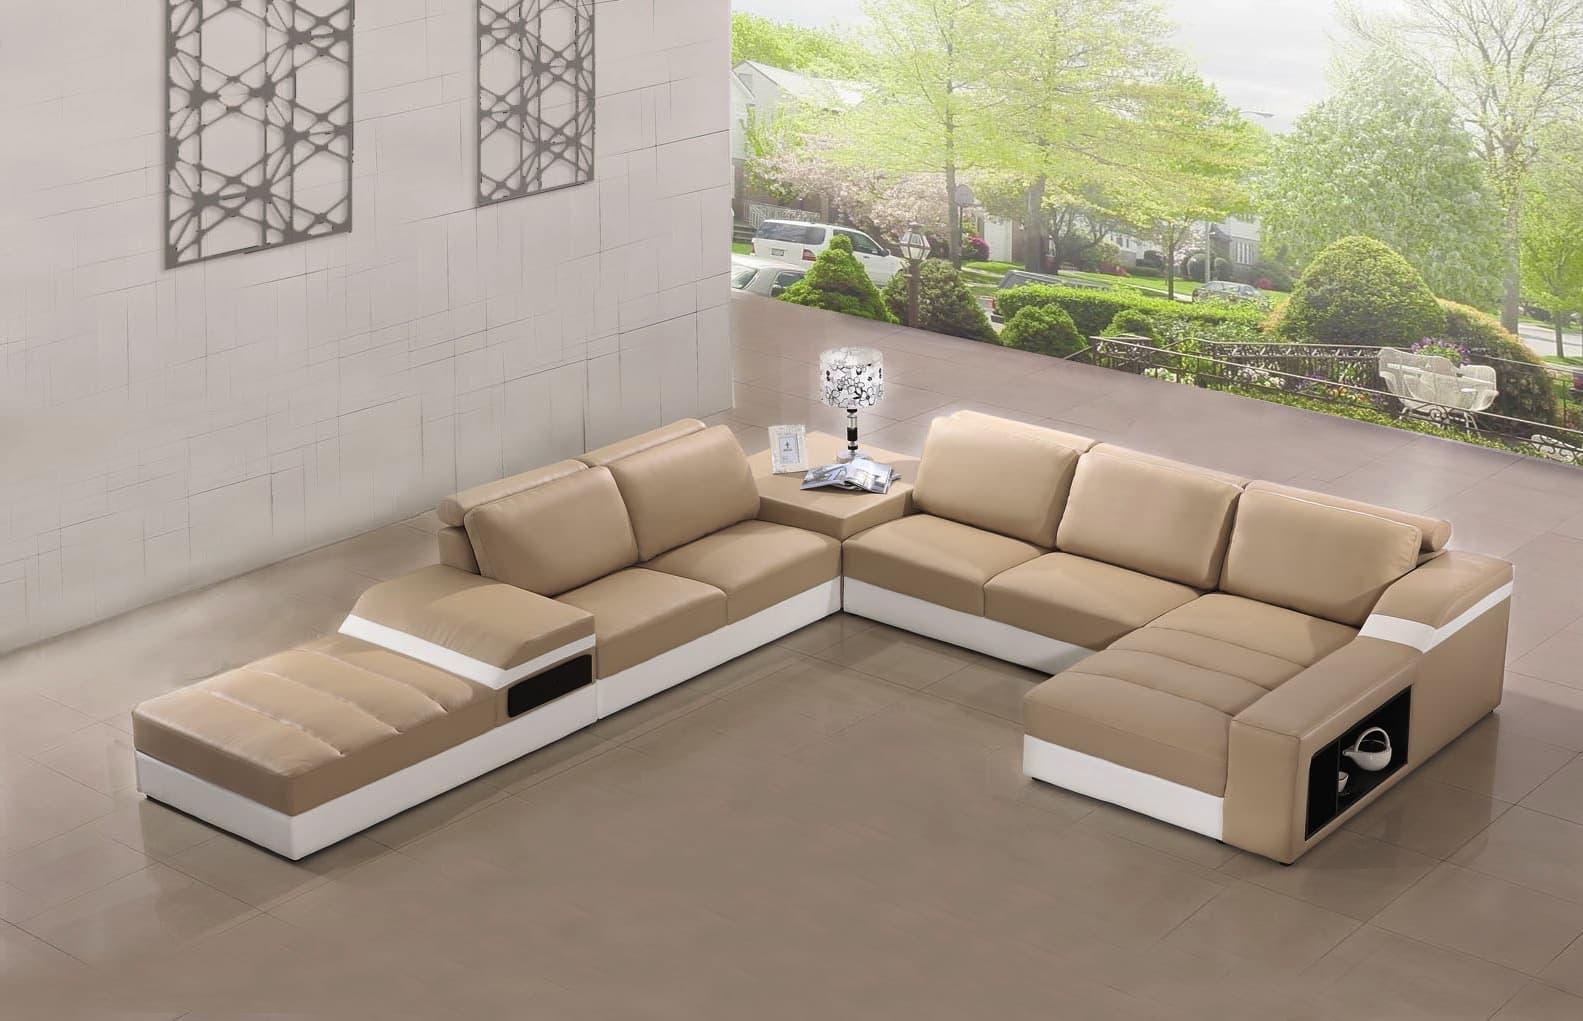 vente flash evenementiel elegancia canap cuir 6 places 185x375x415x95. Black Bedroom Furniture Sets. Home Design Ideas